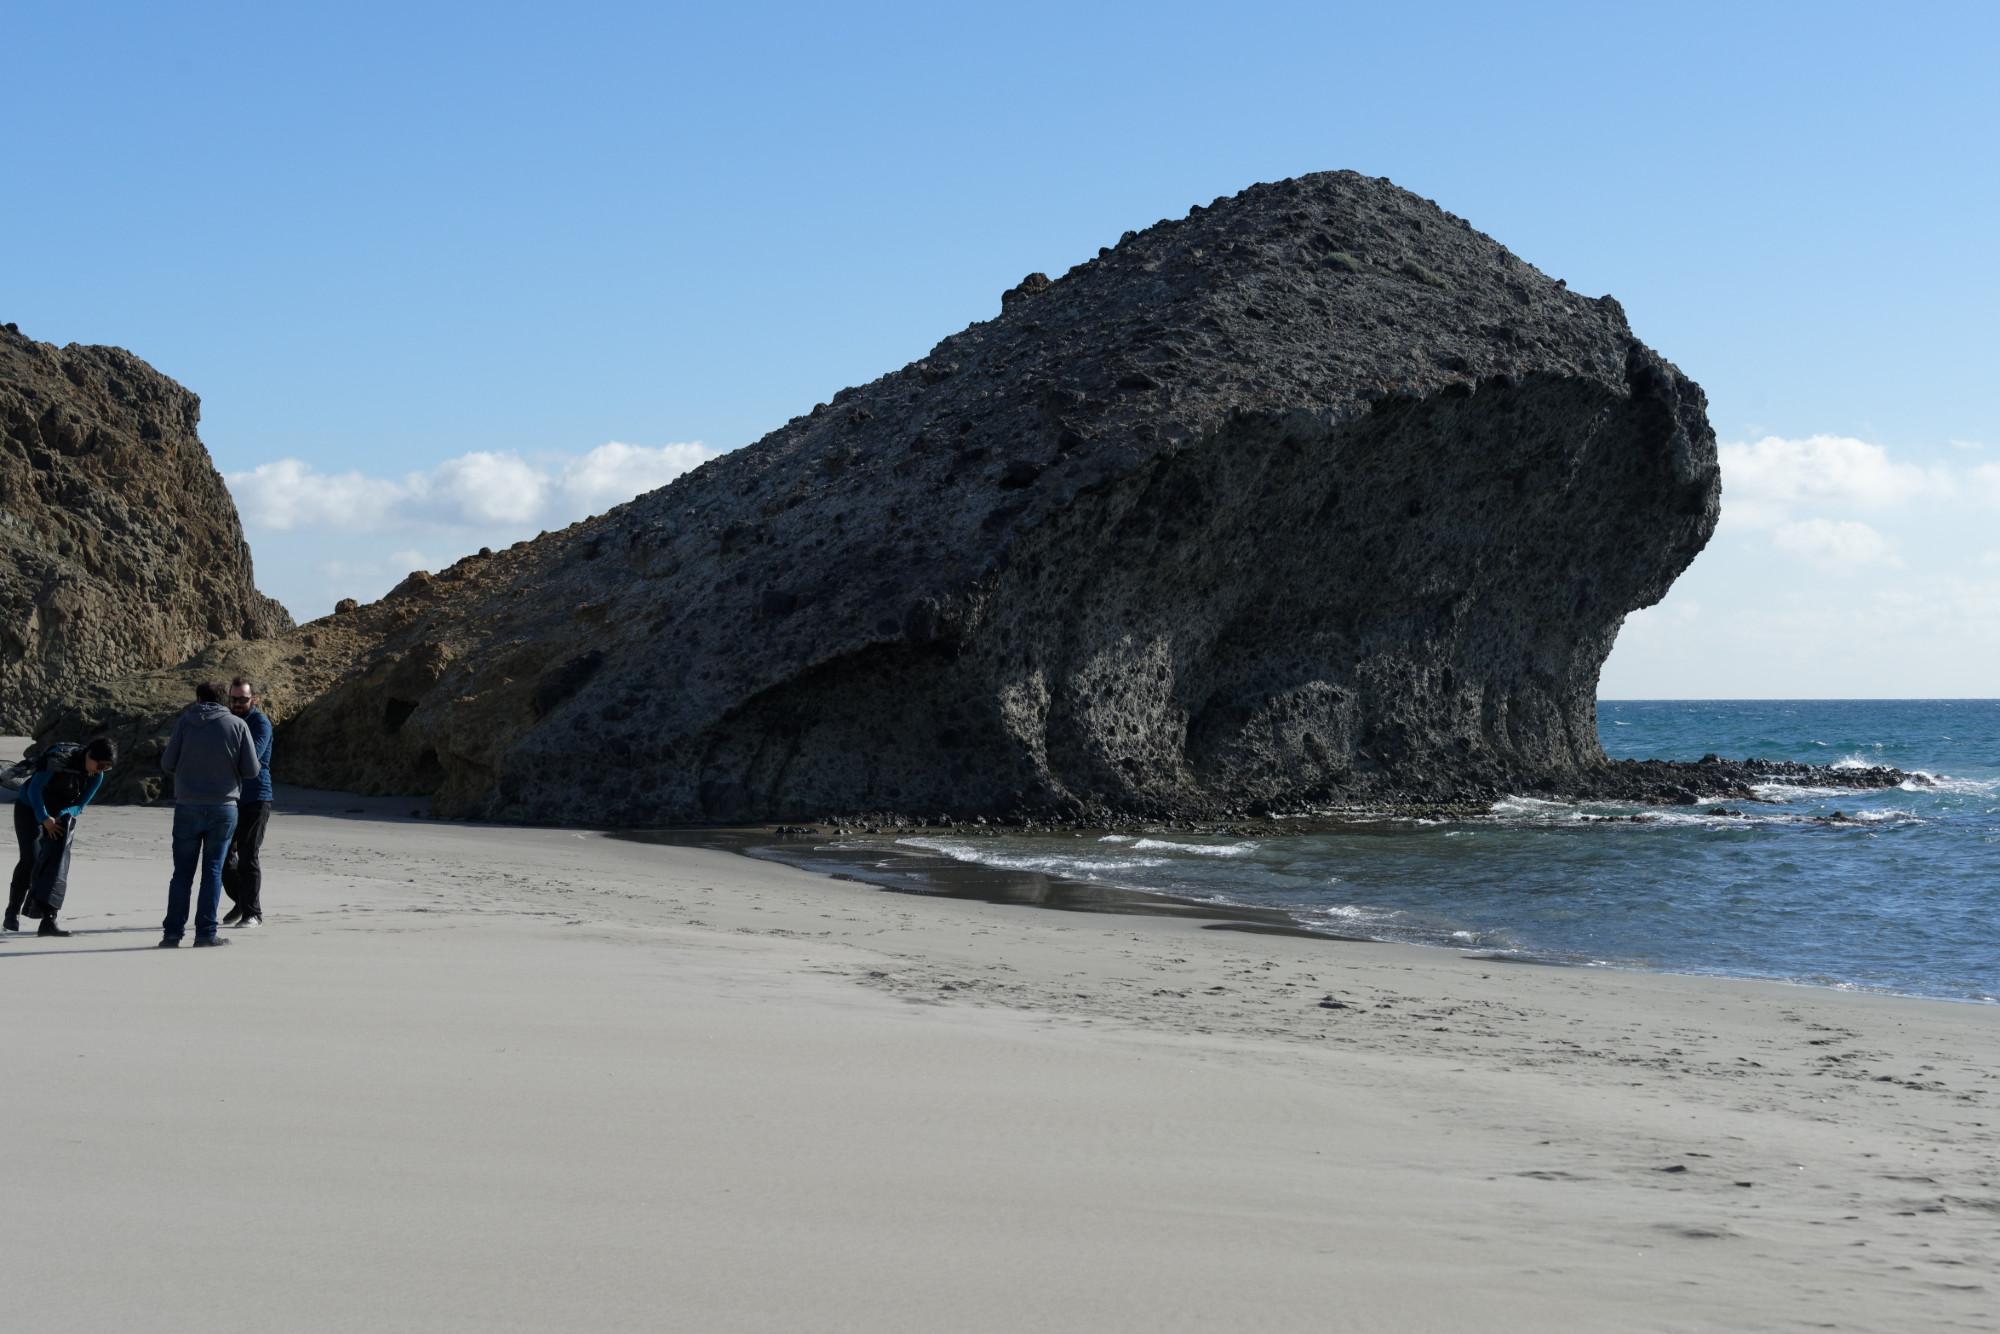 171214-San Jose-Playa del Monsul (Cabo de Gata-Andalousie) (156)